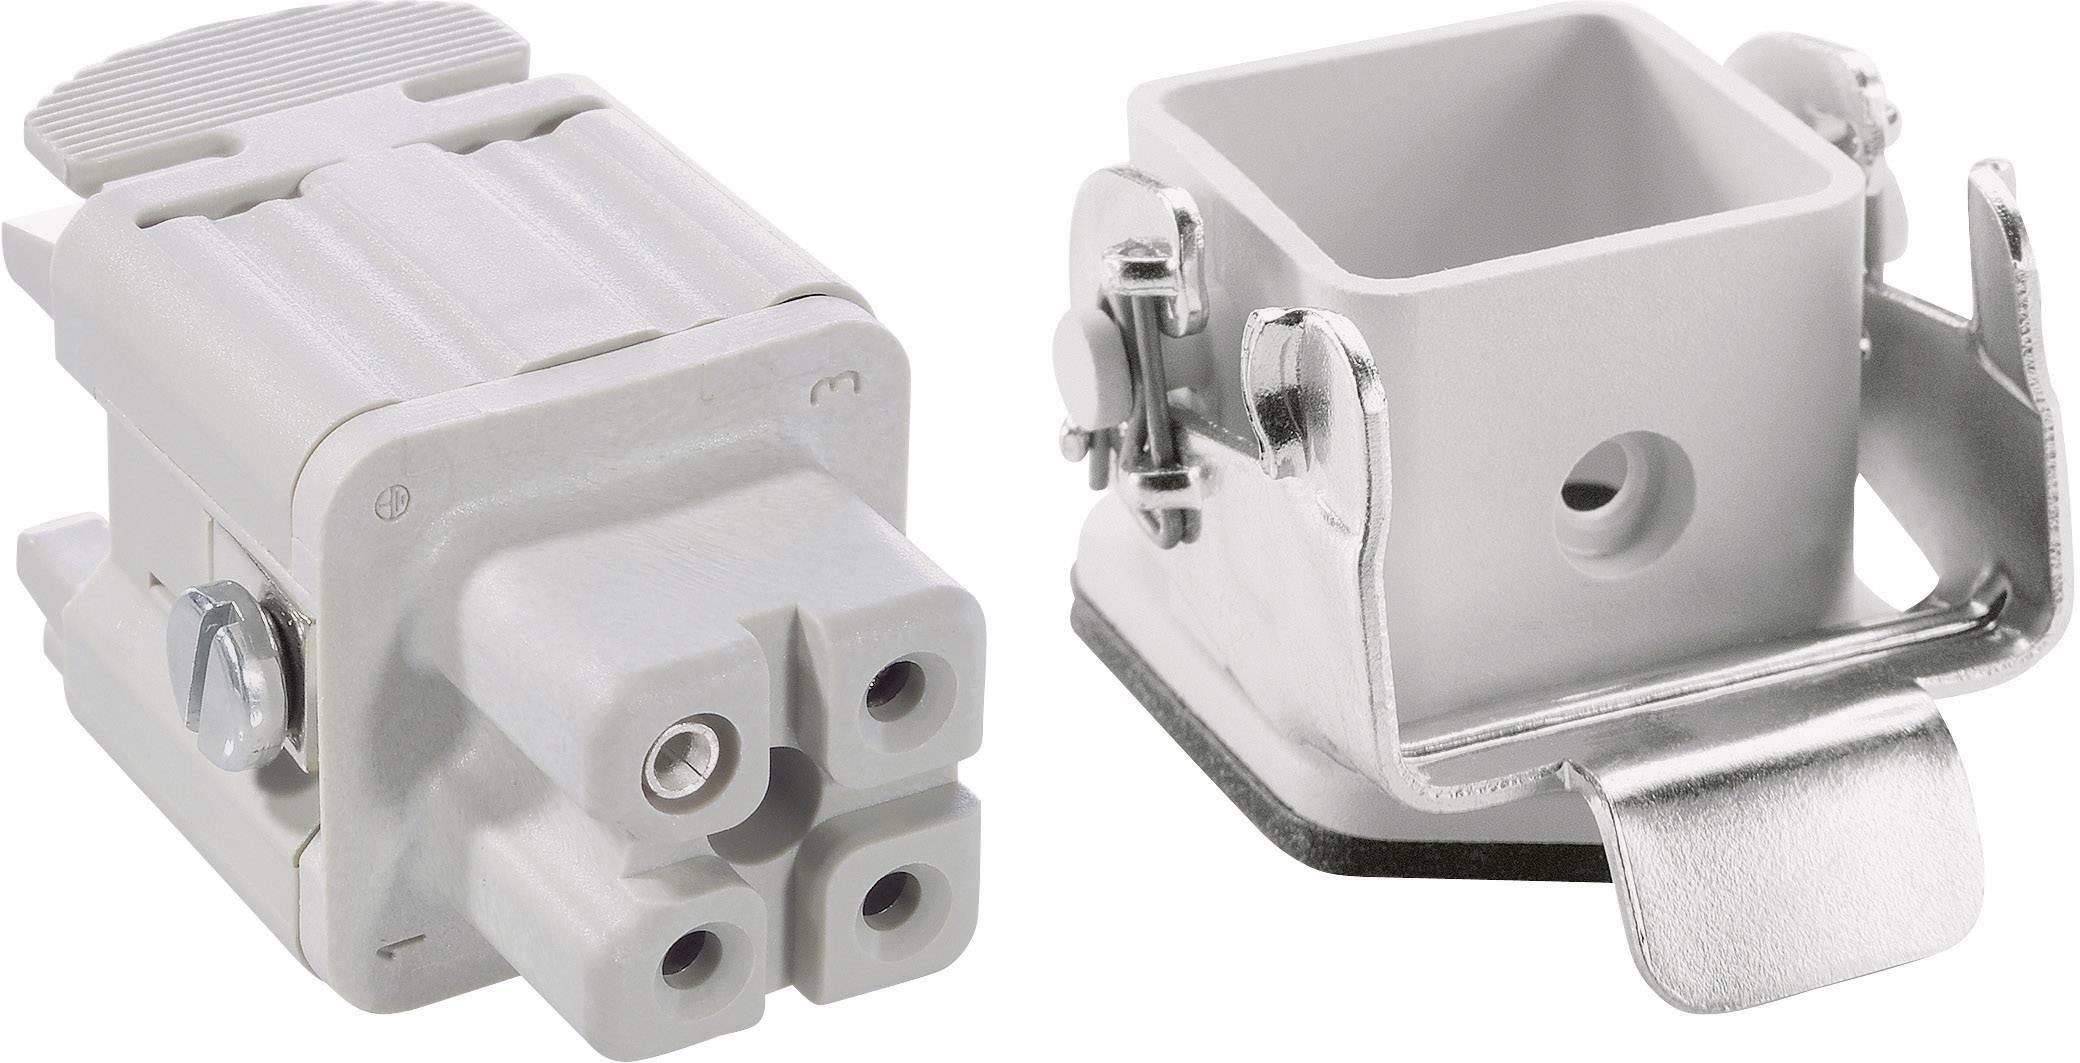 Sada konektoru EPIC®KIT H-A 3 75009605 LAPP 3 + PE šroubovací 1 sada